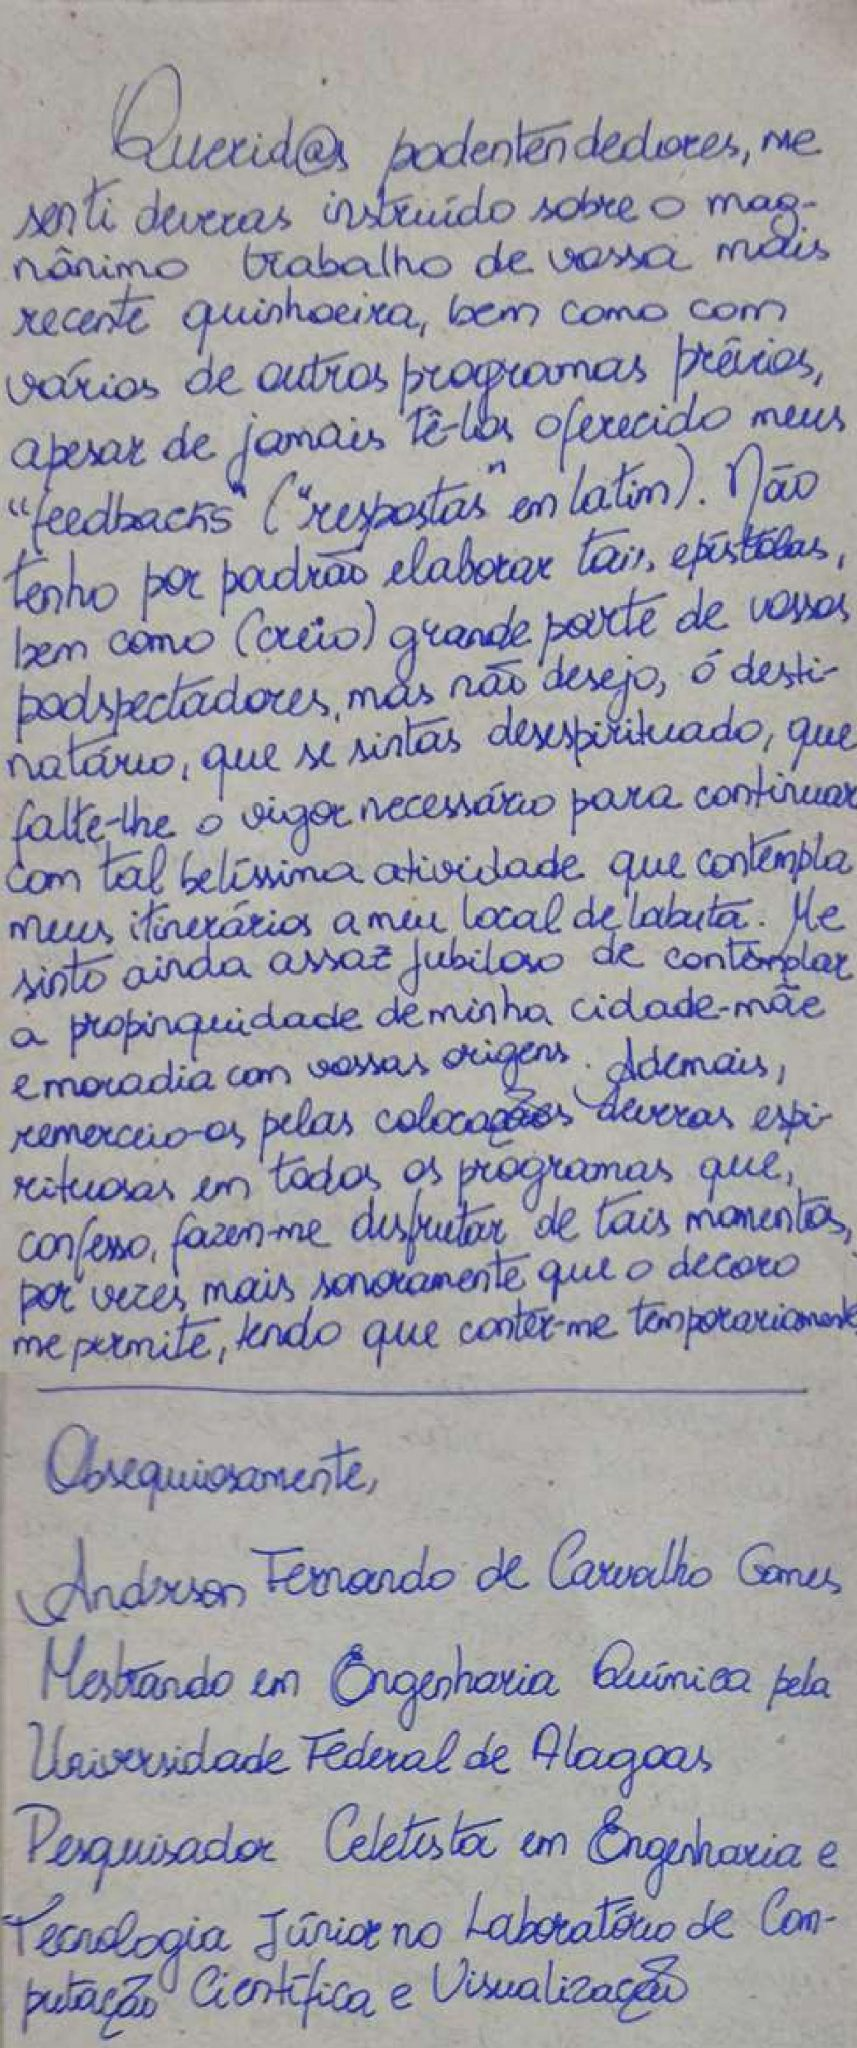 Carta do ouvinte Anderson Gomes lida no bloco de e-mails